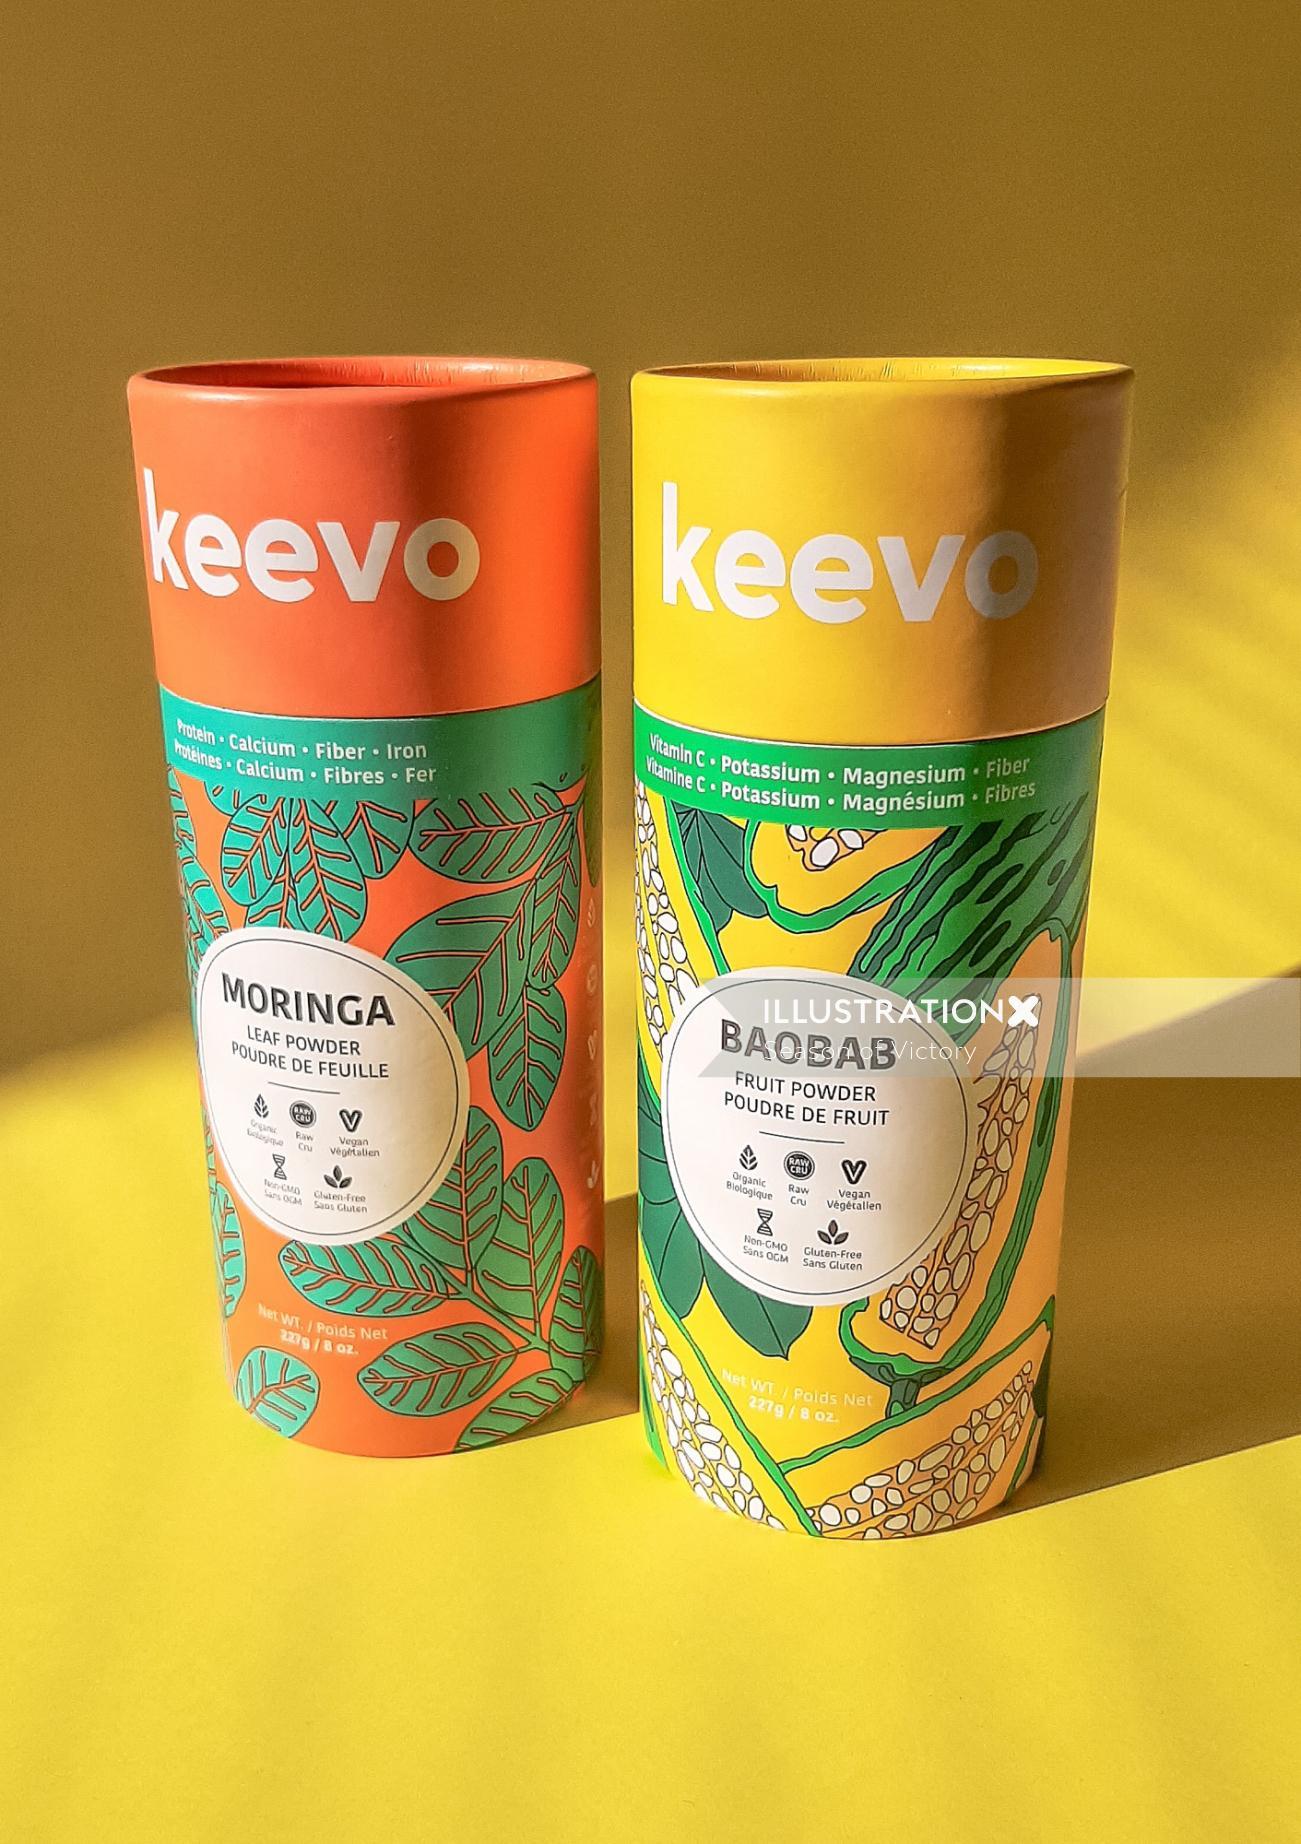 nutrition, plantbased, vegan, packaging, packaging design, supplements, food, drink, health, beauty,